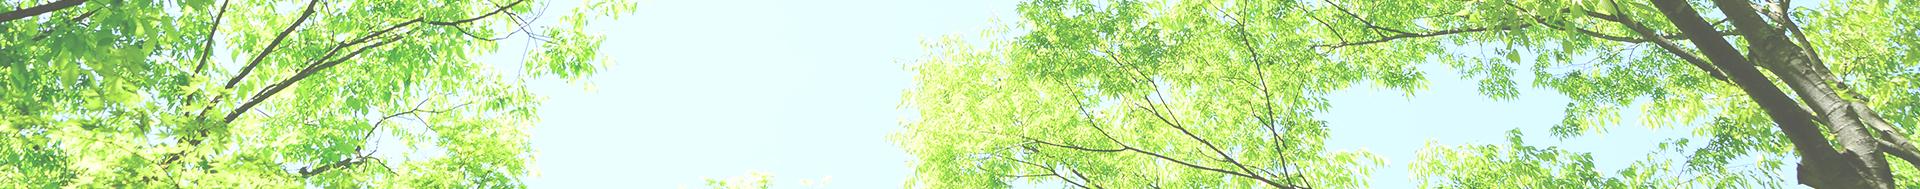 札幌・直葬5万・家族葬14万・無宗教葬8万・生活保護葬・実質負担0円~・小規模葬儀・福祉葬│アイシンセレモニー